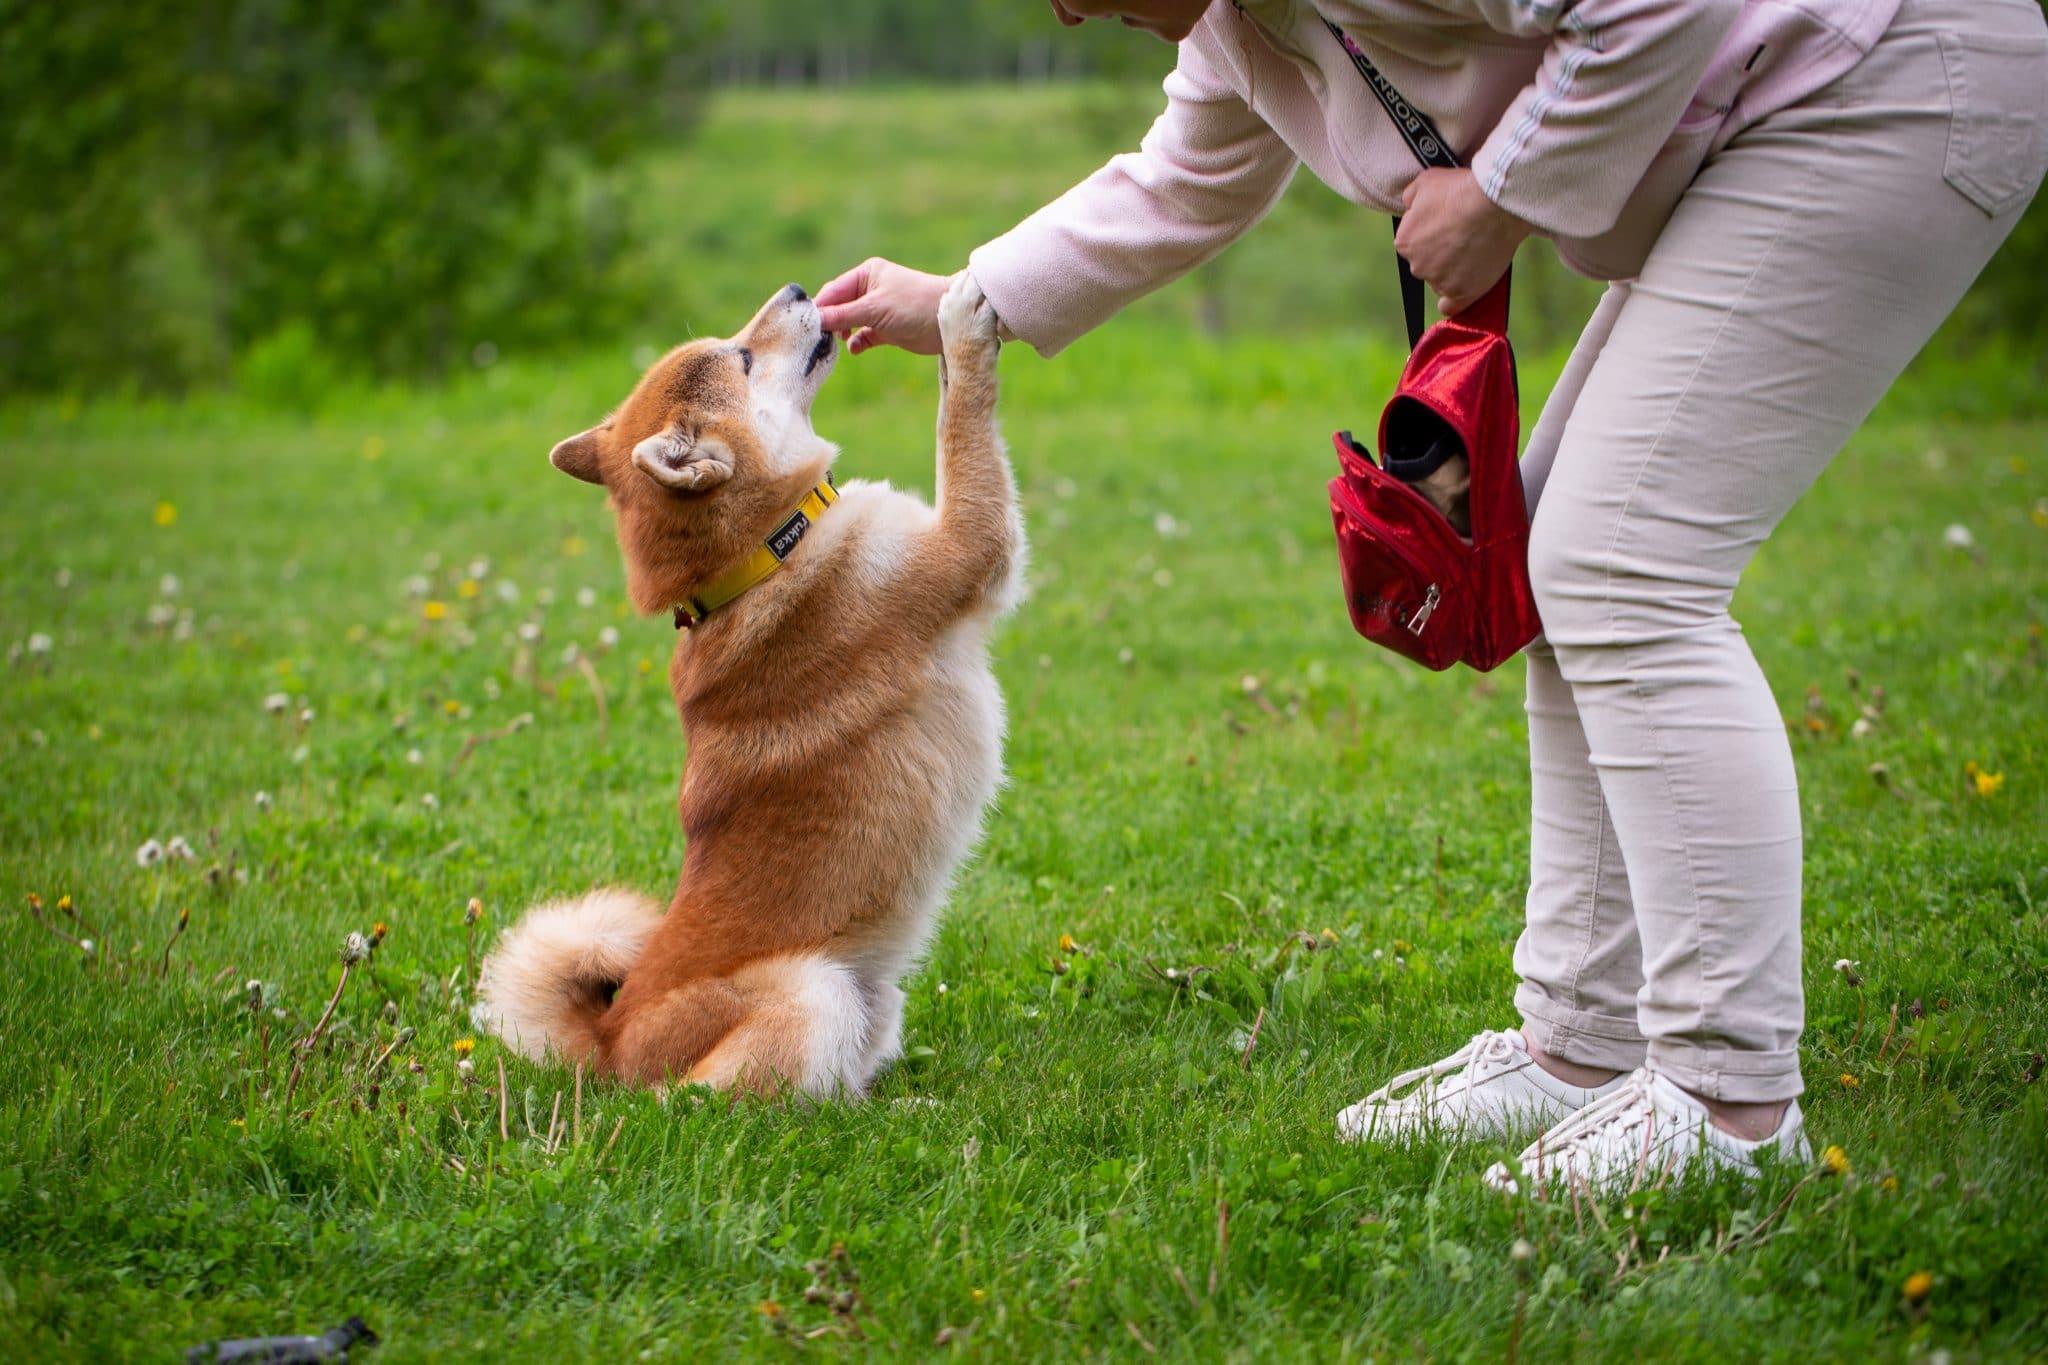 shiba inu training with treats